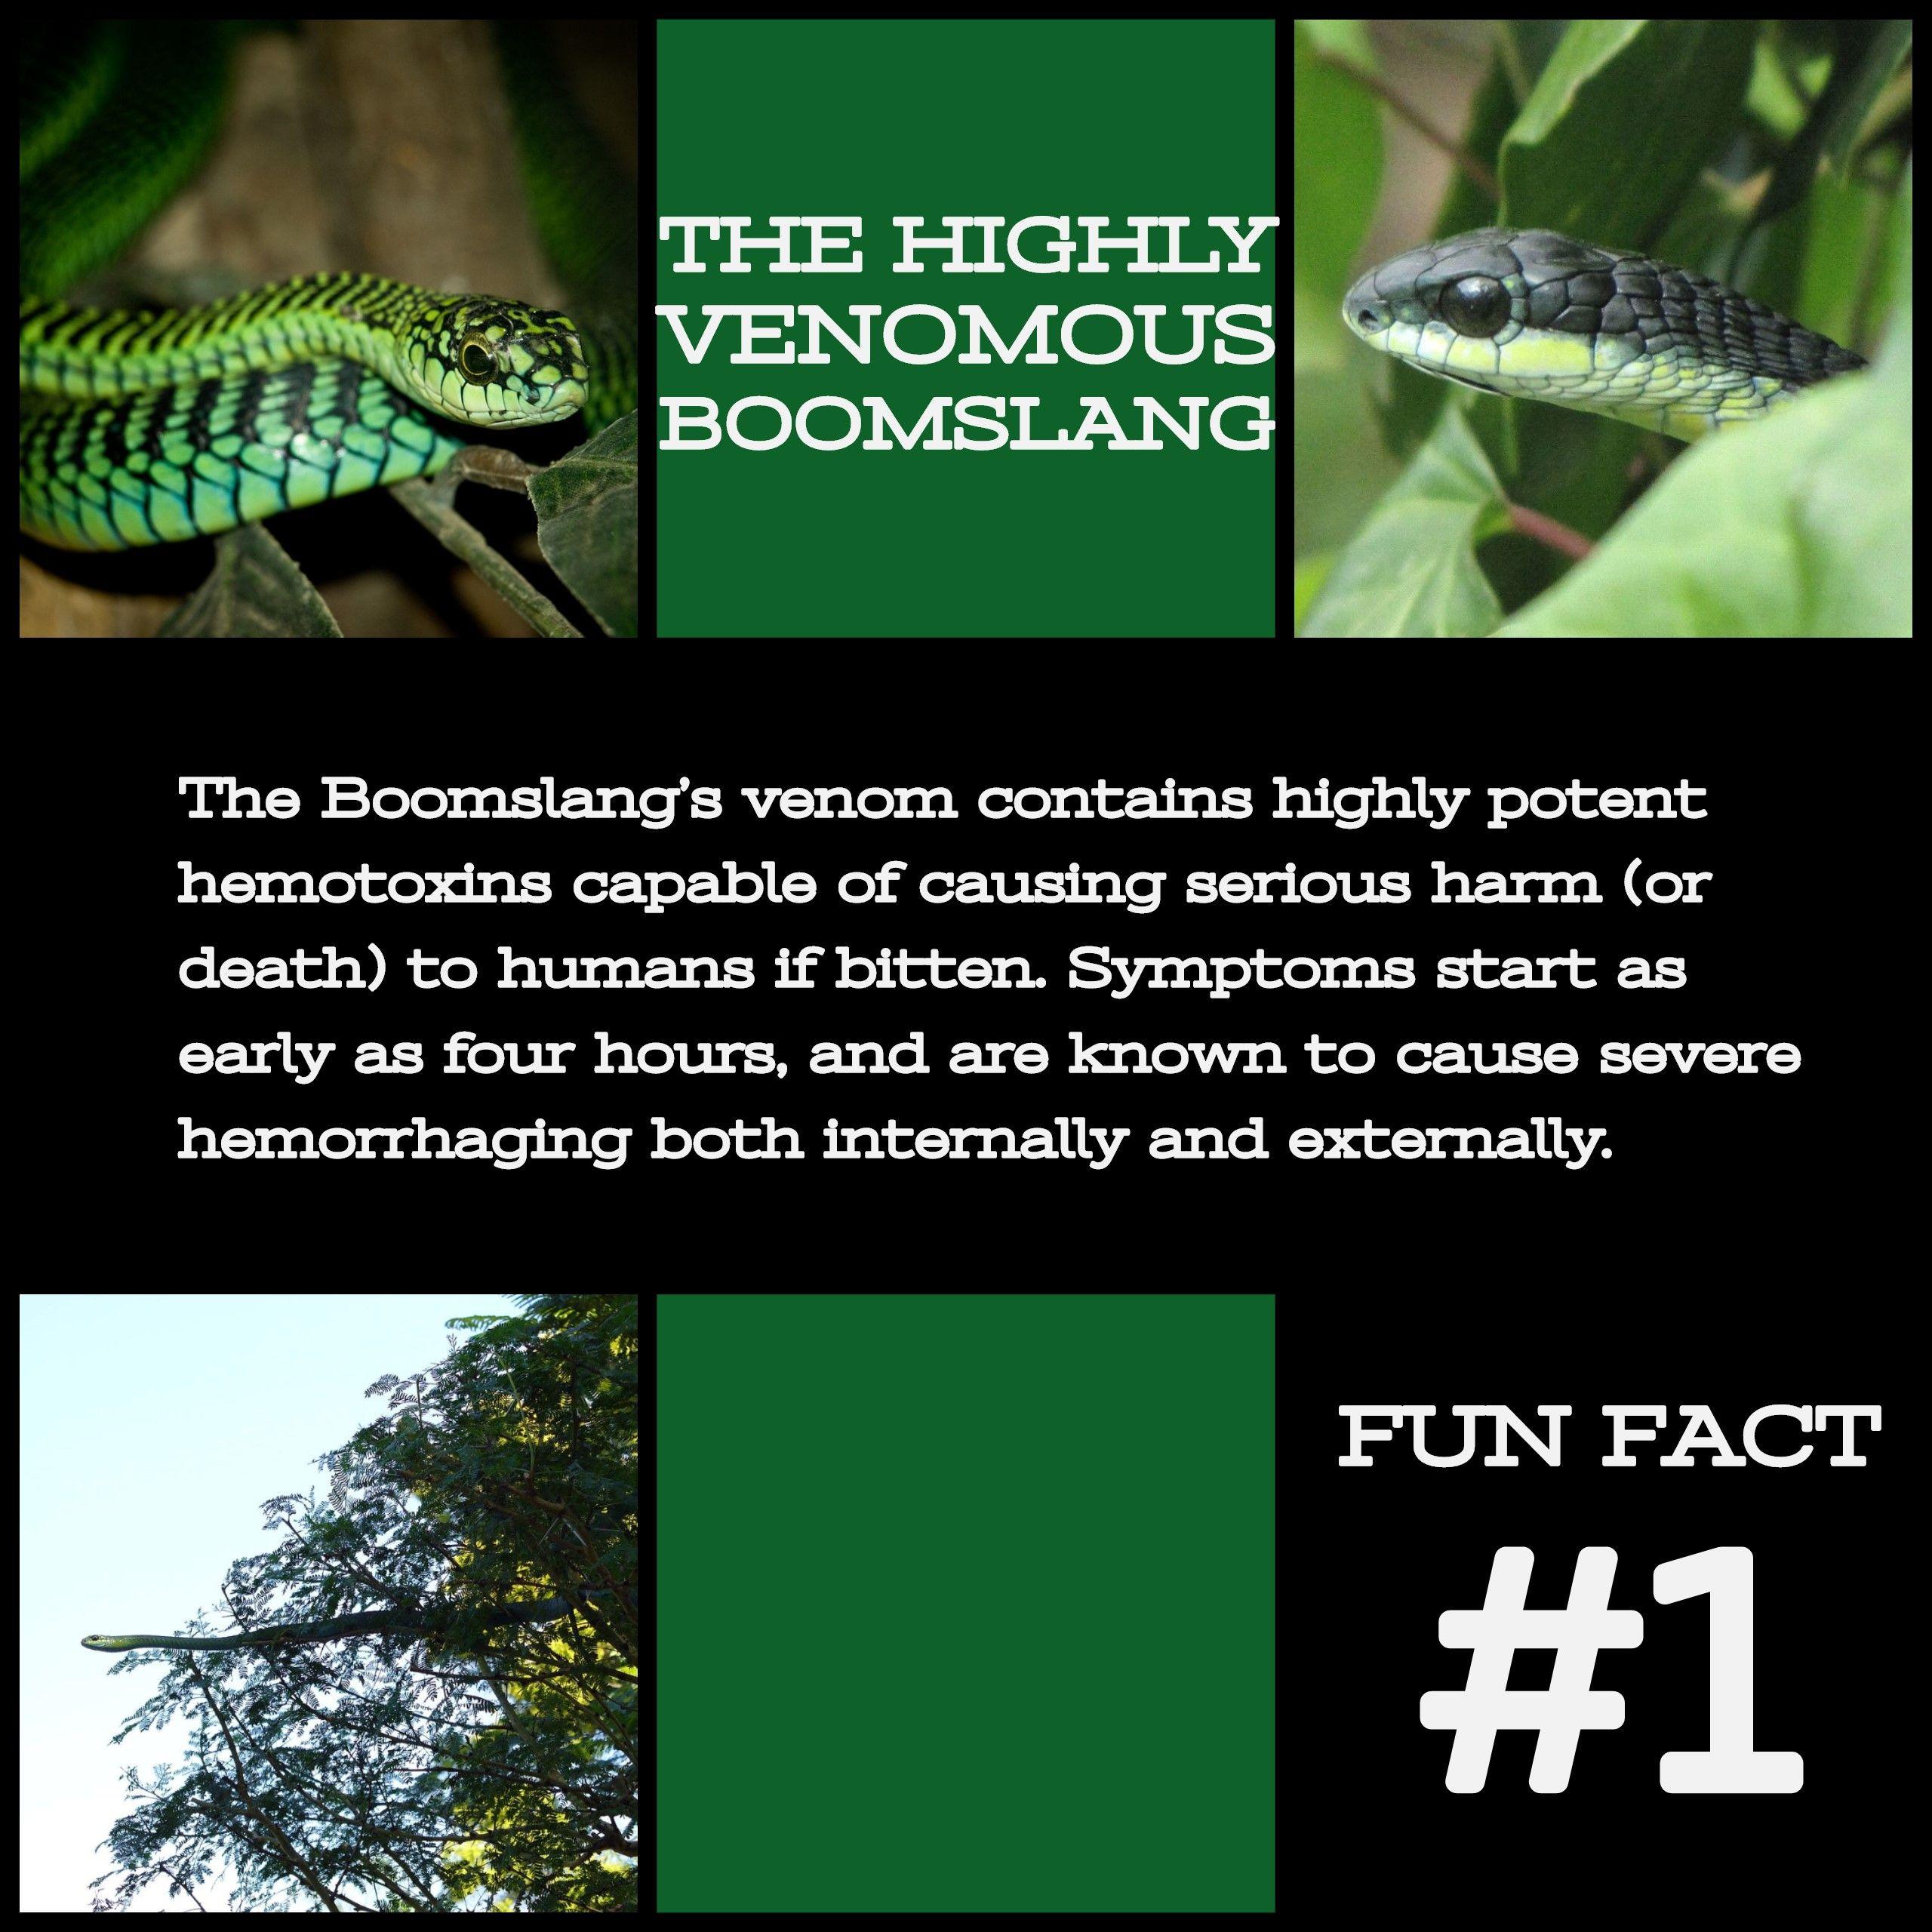 The Highly Venomous Boomslang The Highly Venomous Boomslang: Fun Facts.